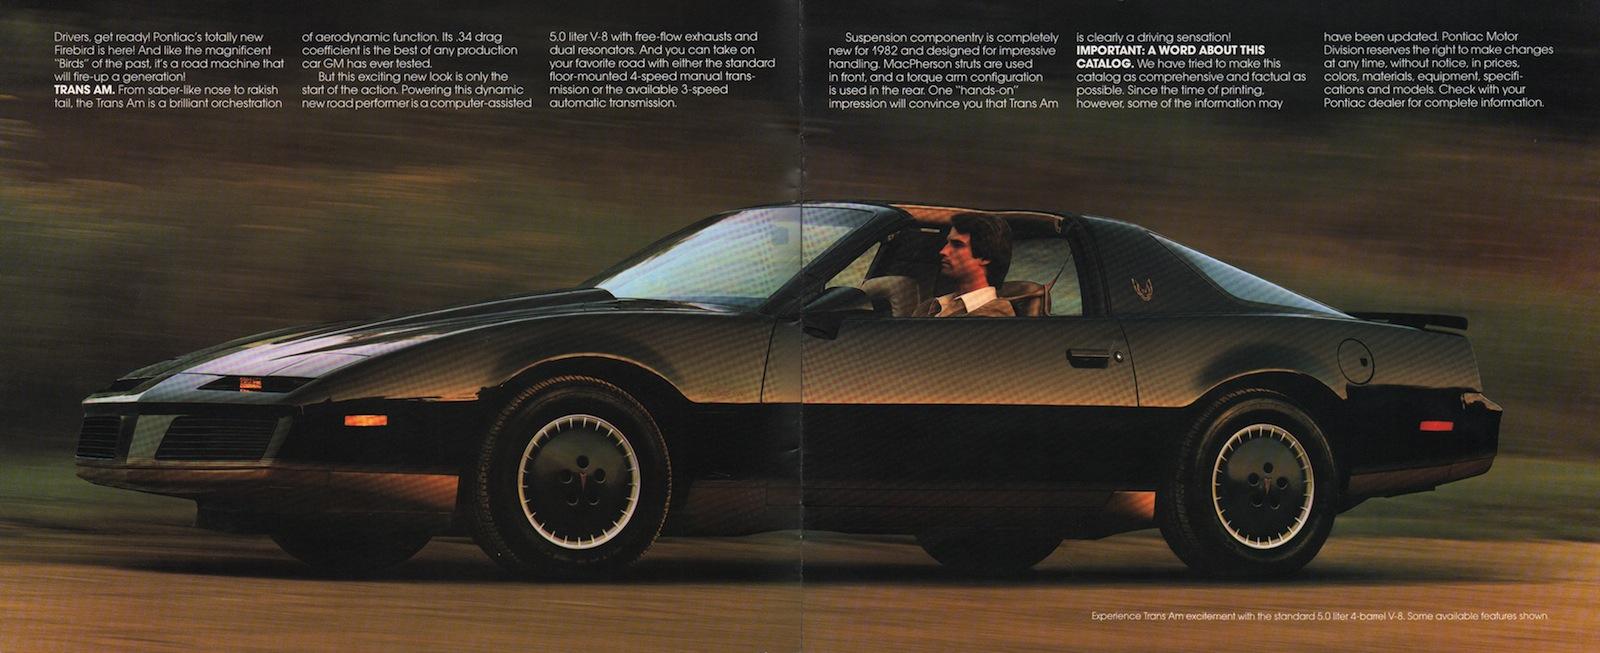 gm 1982 pontiac firebird sales brochure. Black Bedroom Furniture Sets. Home Design Ideas